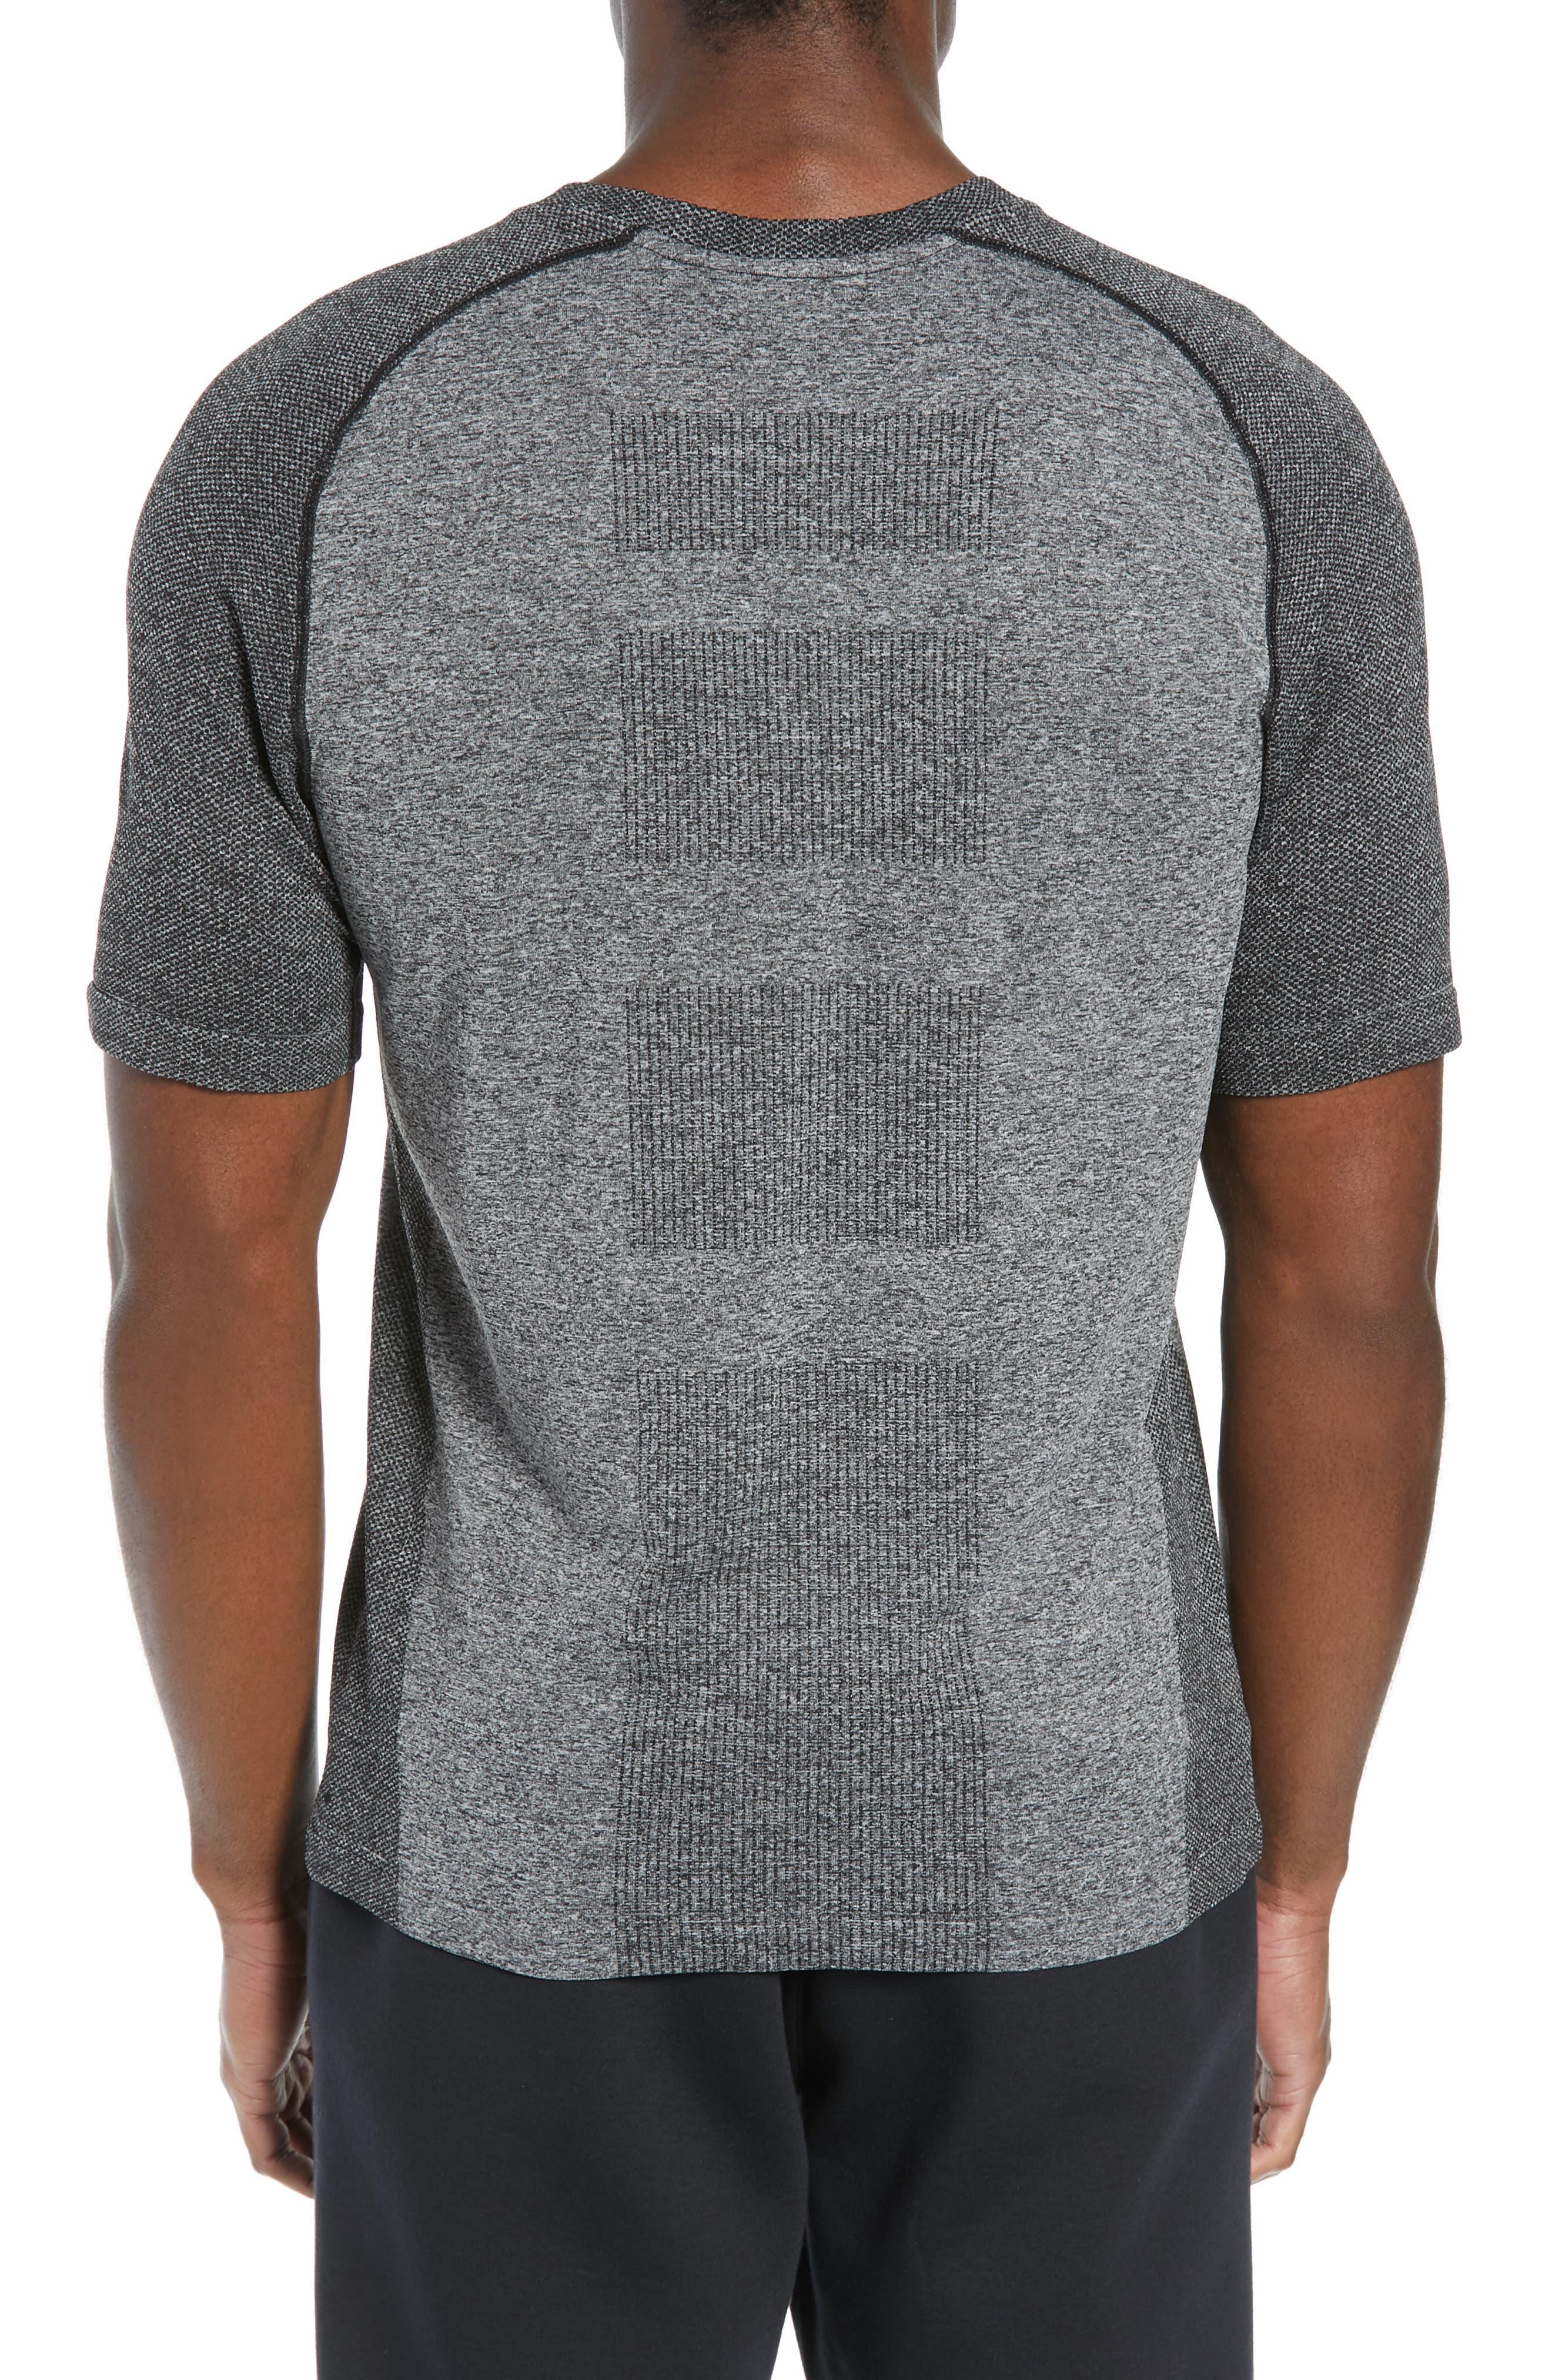 ZELLA, Seamless Raglan T-Shirt, Alternate thumbnail 2, color, BLACK OXIDE MELANGE